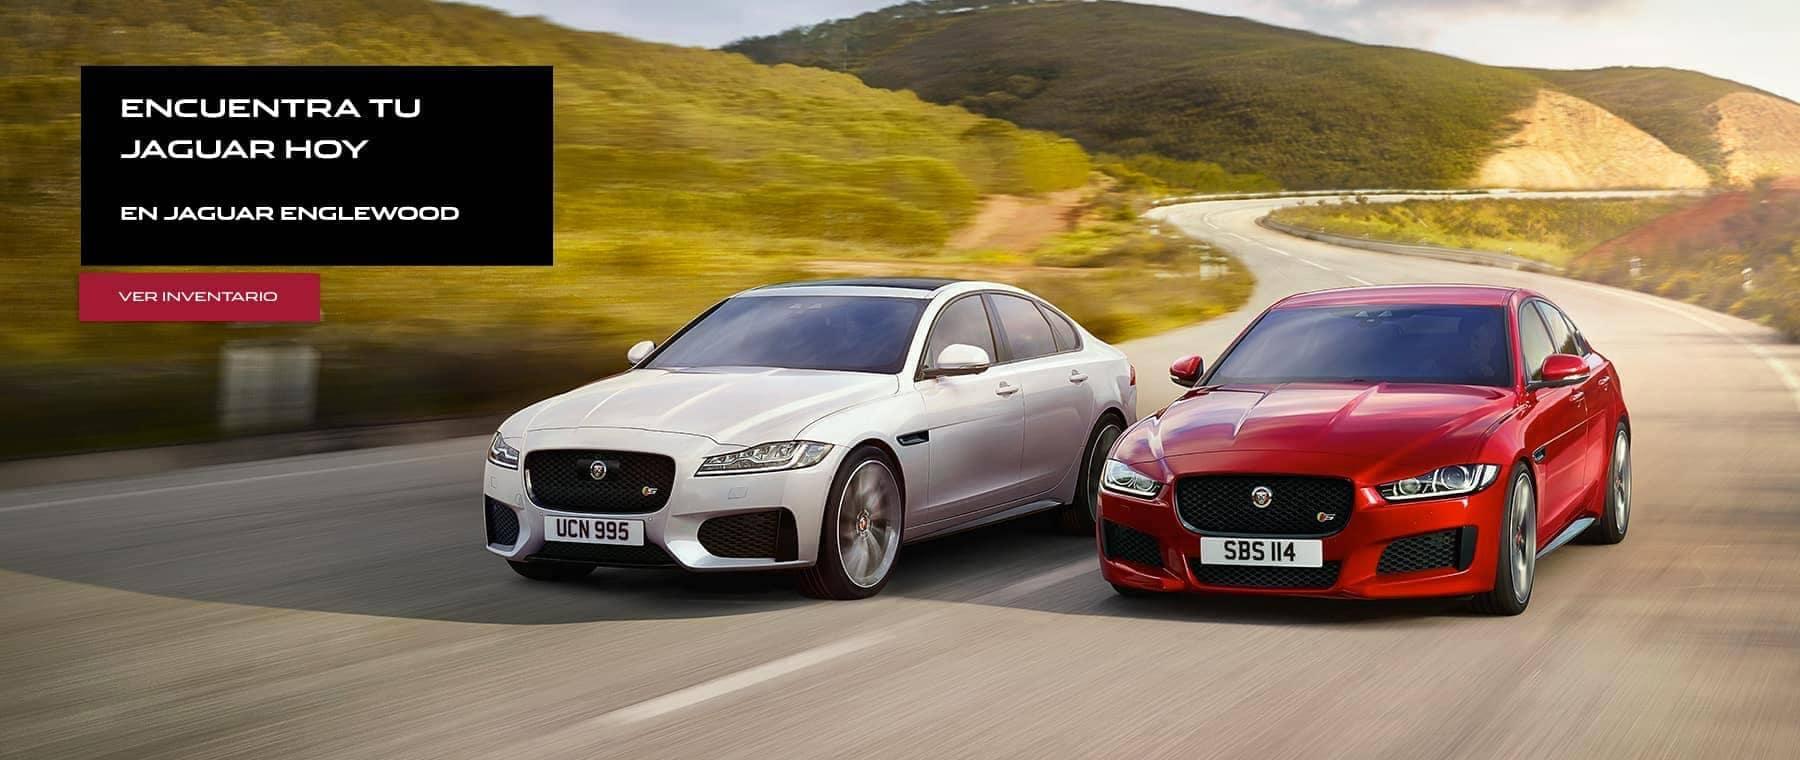 Jaguar Englewood